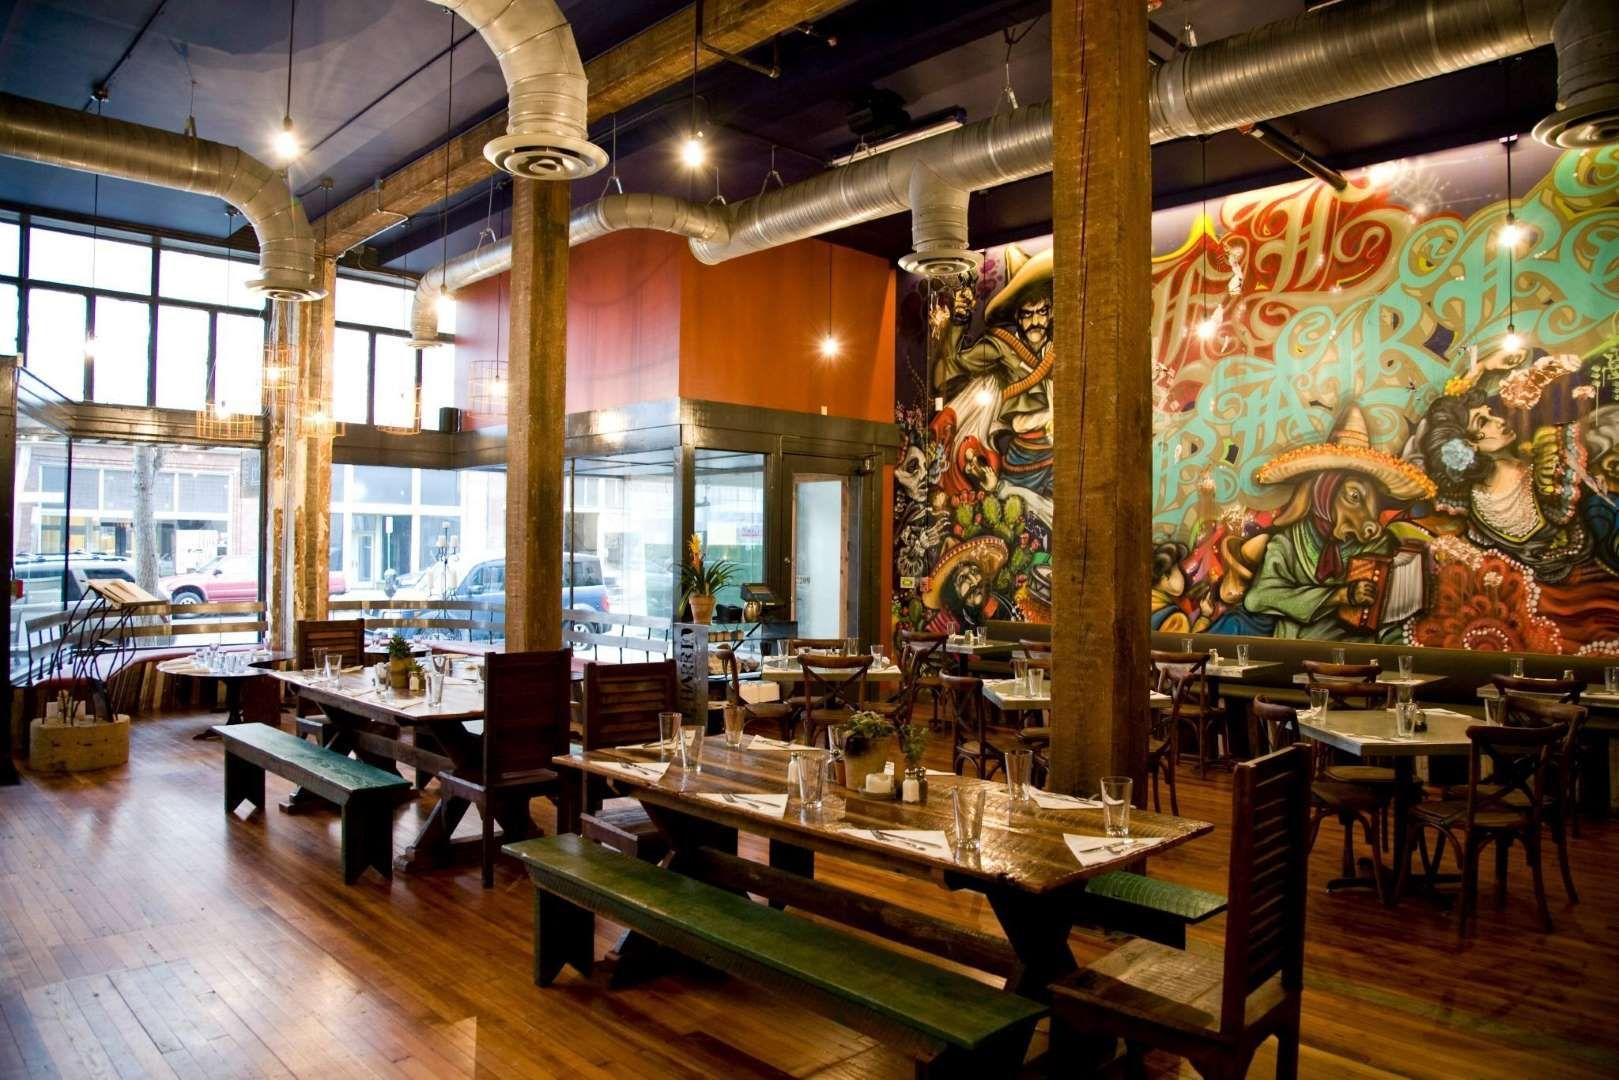 City Birminghamdowntown Birmingham S El Barrio Is Nothing Short Of Spectacular Because Of Its Off Best Mexican Restaurants Mexican Restaurant Restaurant